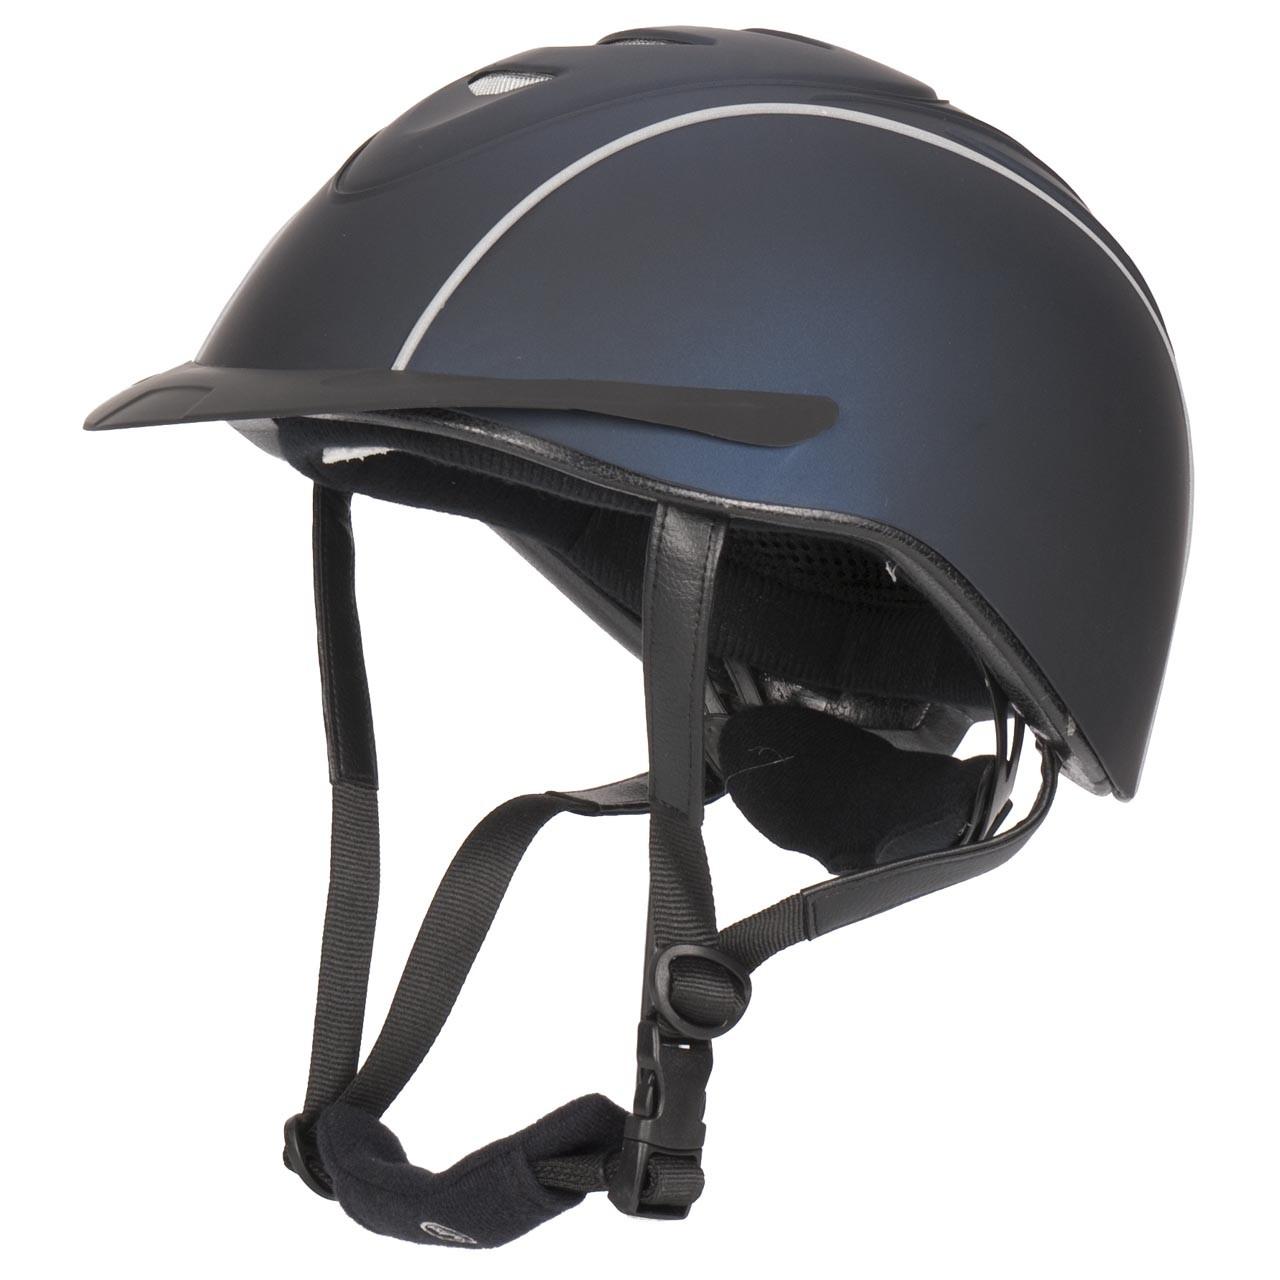 BR Viper Patron VG1 cap donkerblauw maat:52-56